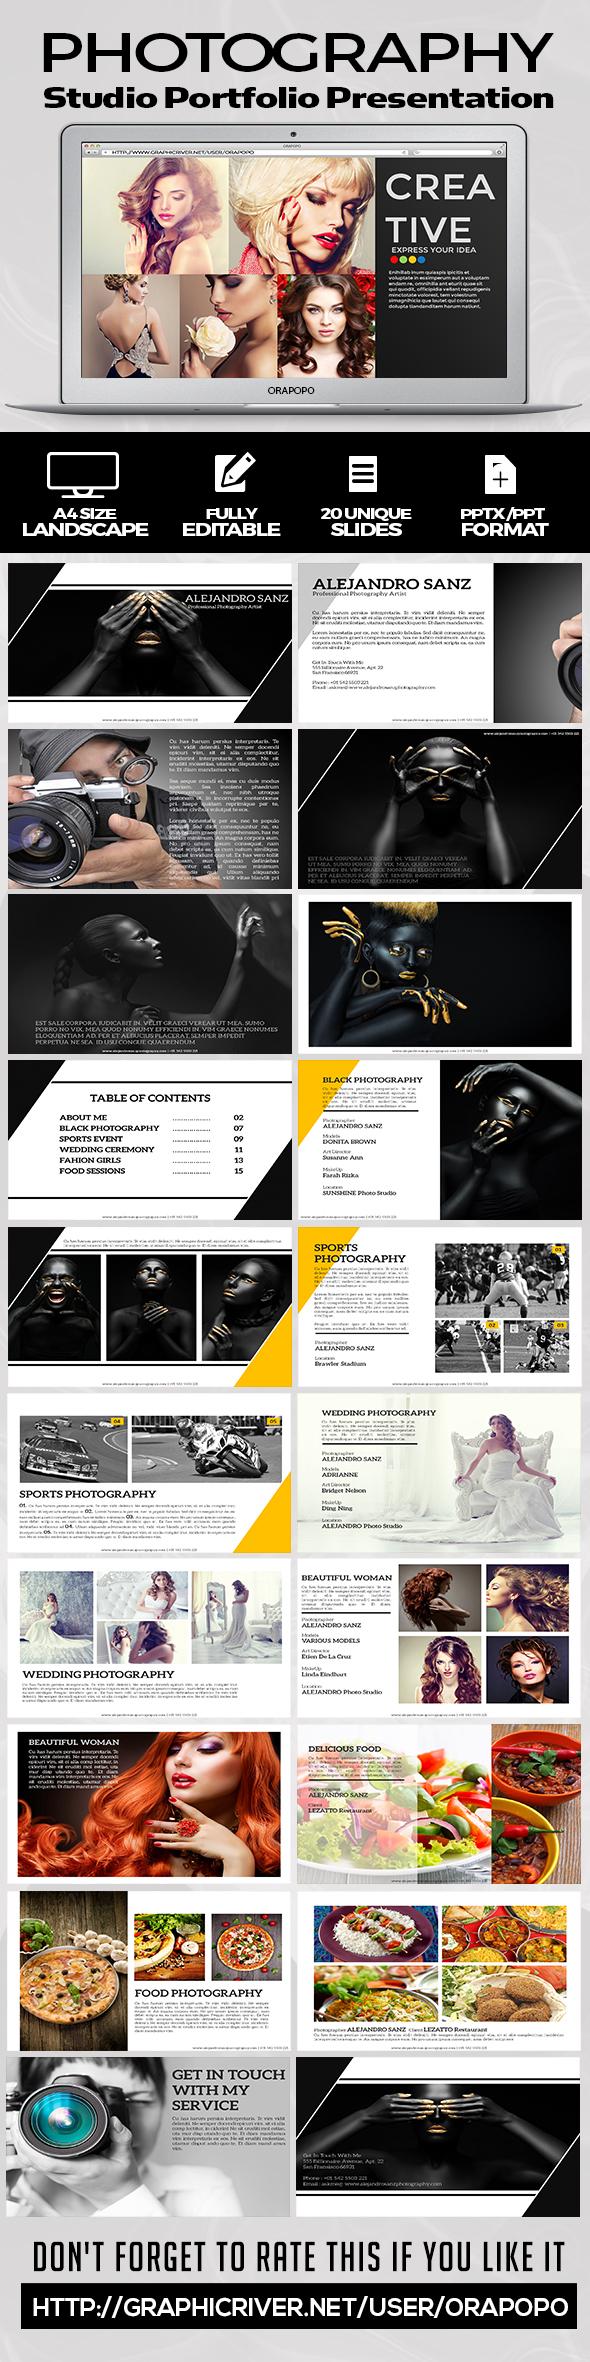 Photography Studio Portfolio Presentation - Creative PowerPoint Templates